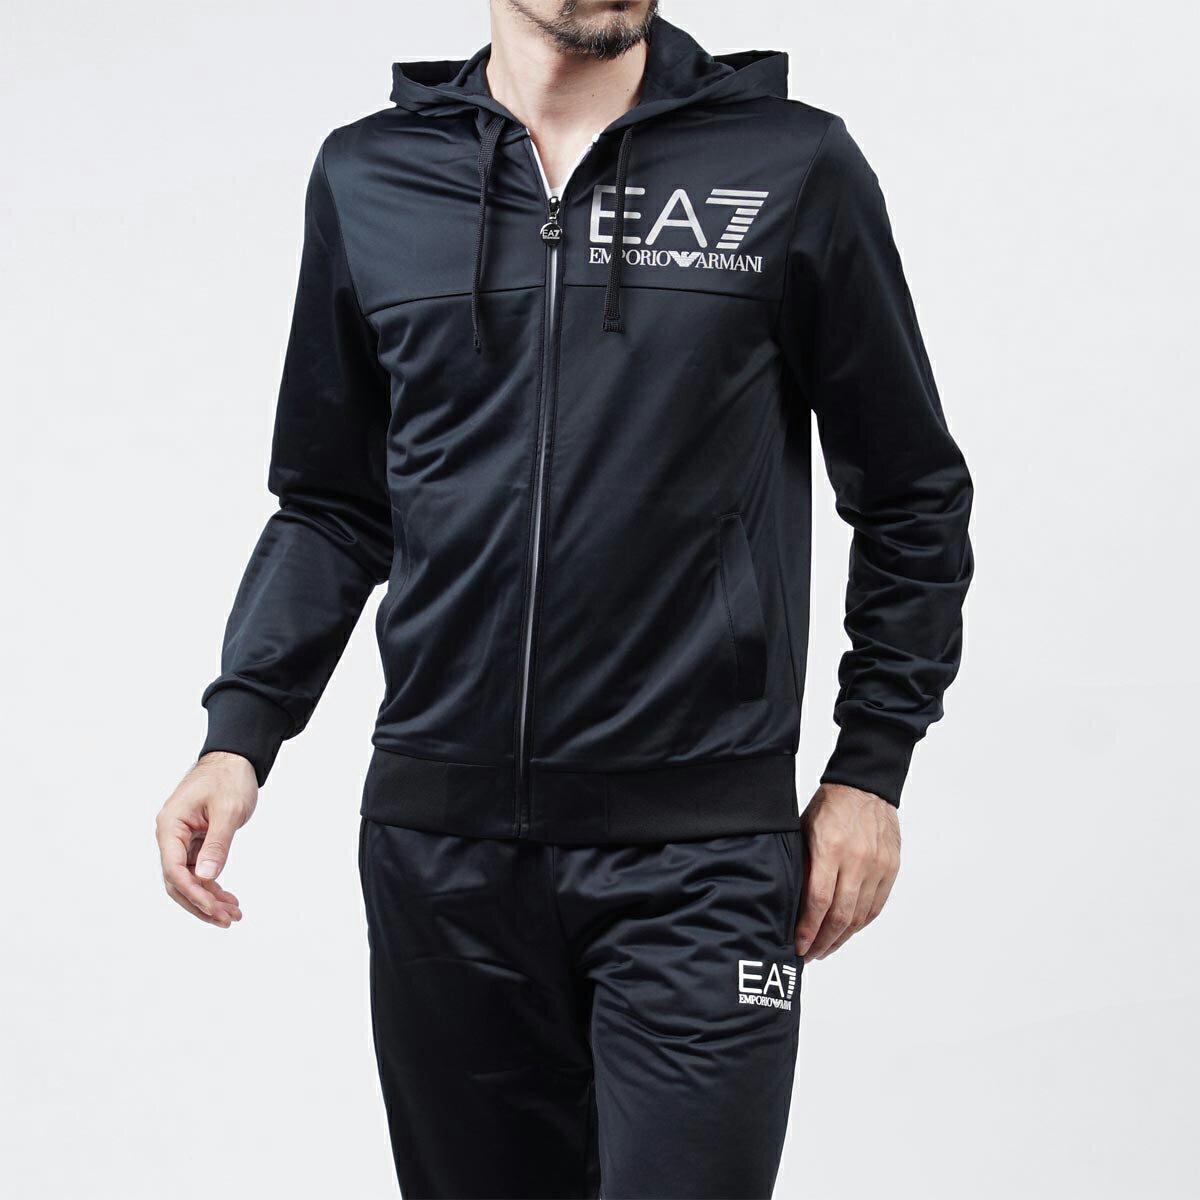 美國百分百【全新真品】Emporio Armani 外套 連帽 夾克 EA7 尼龍 運動 深藍 S號 F825